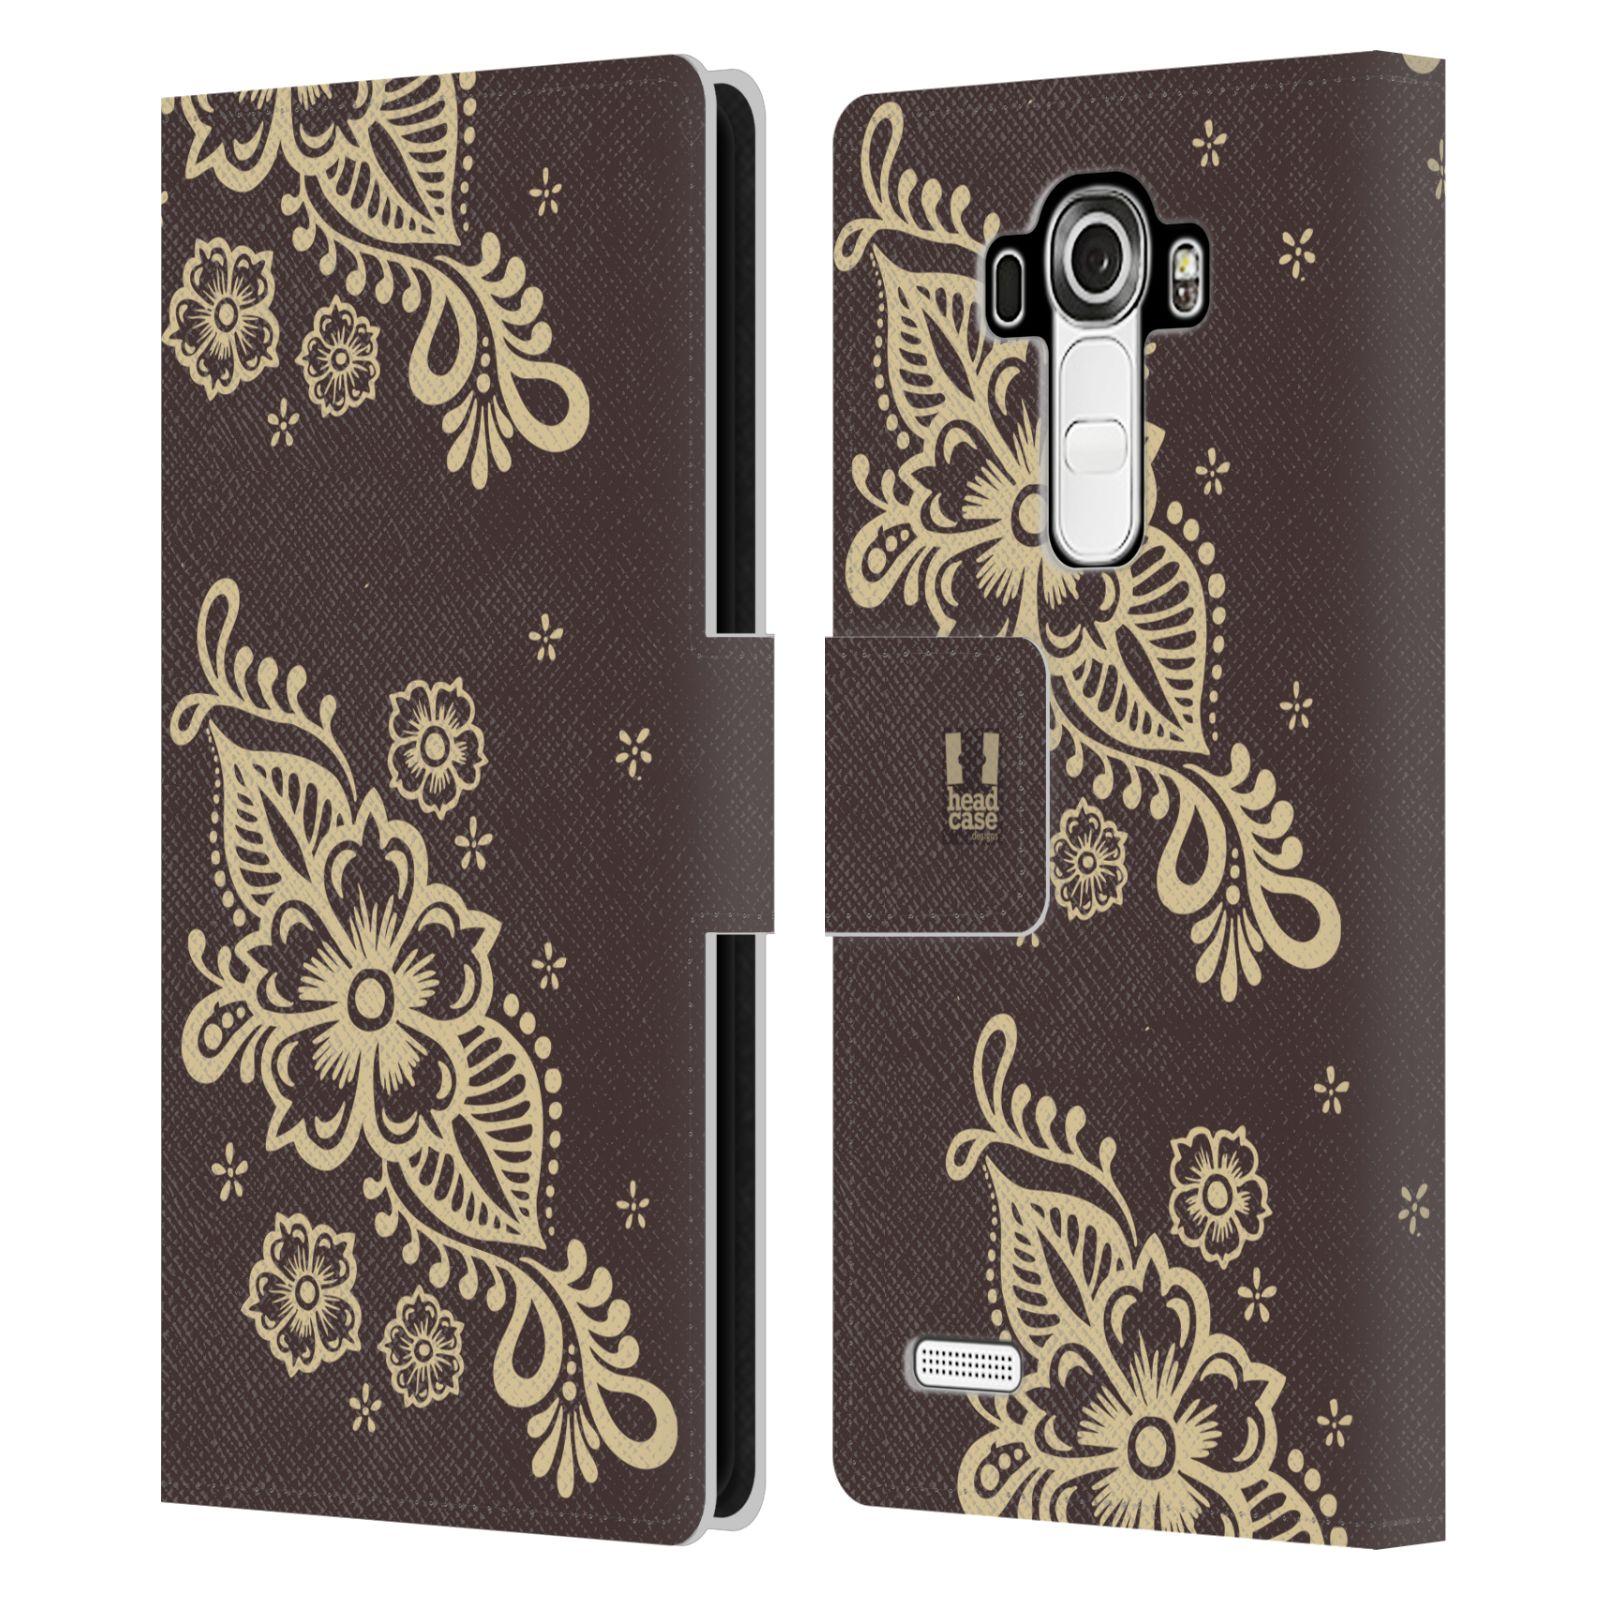 HEAD CASE Flipové pouzdro pro mobil LG G4 (H815) Hena kresba víno